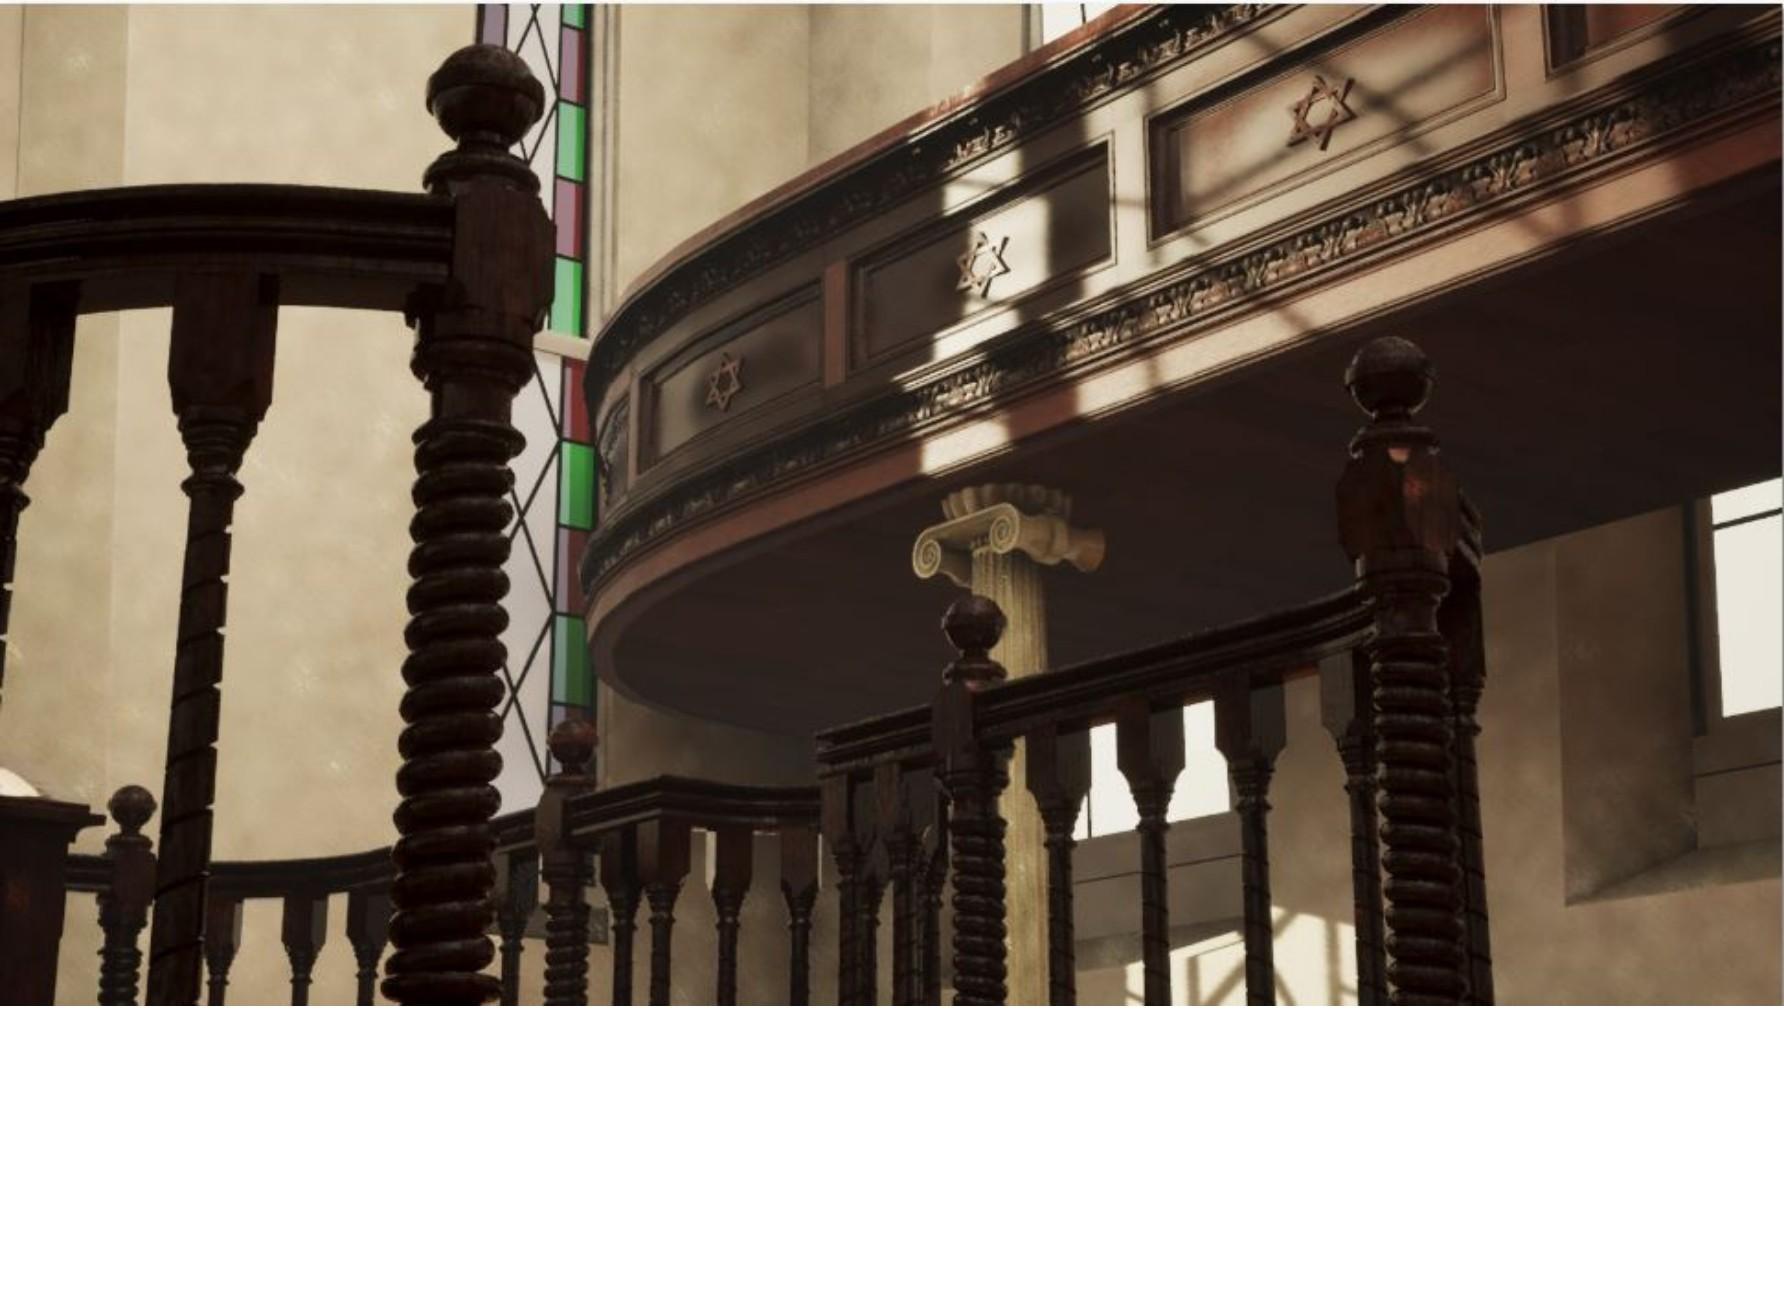 "<span class=""slider_description"">6 of 6. Ornamental details inside the York Street Synagogue. Virtual reconstruction 2021.</span>"